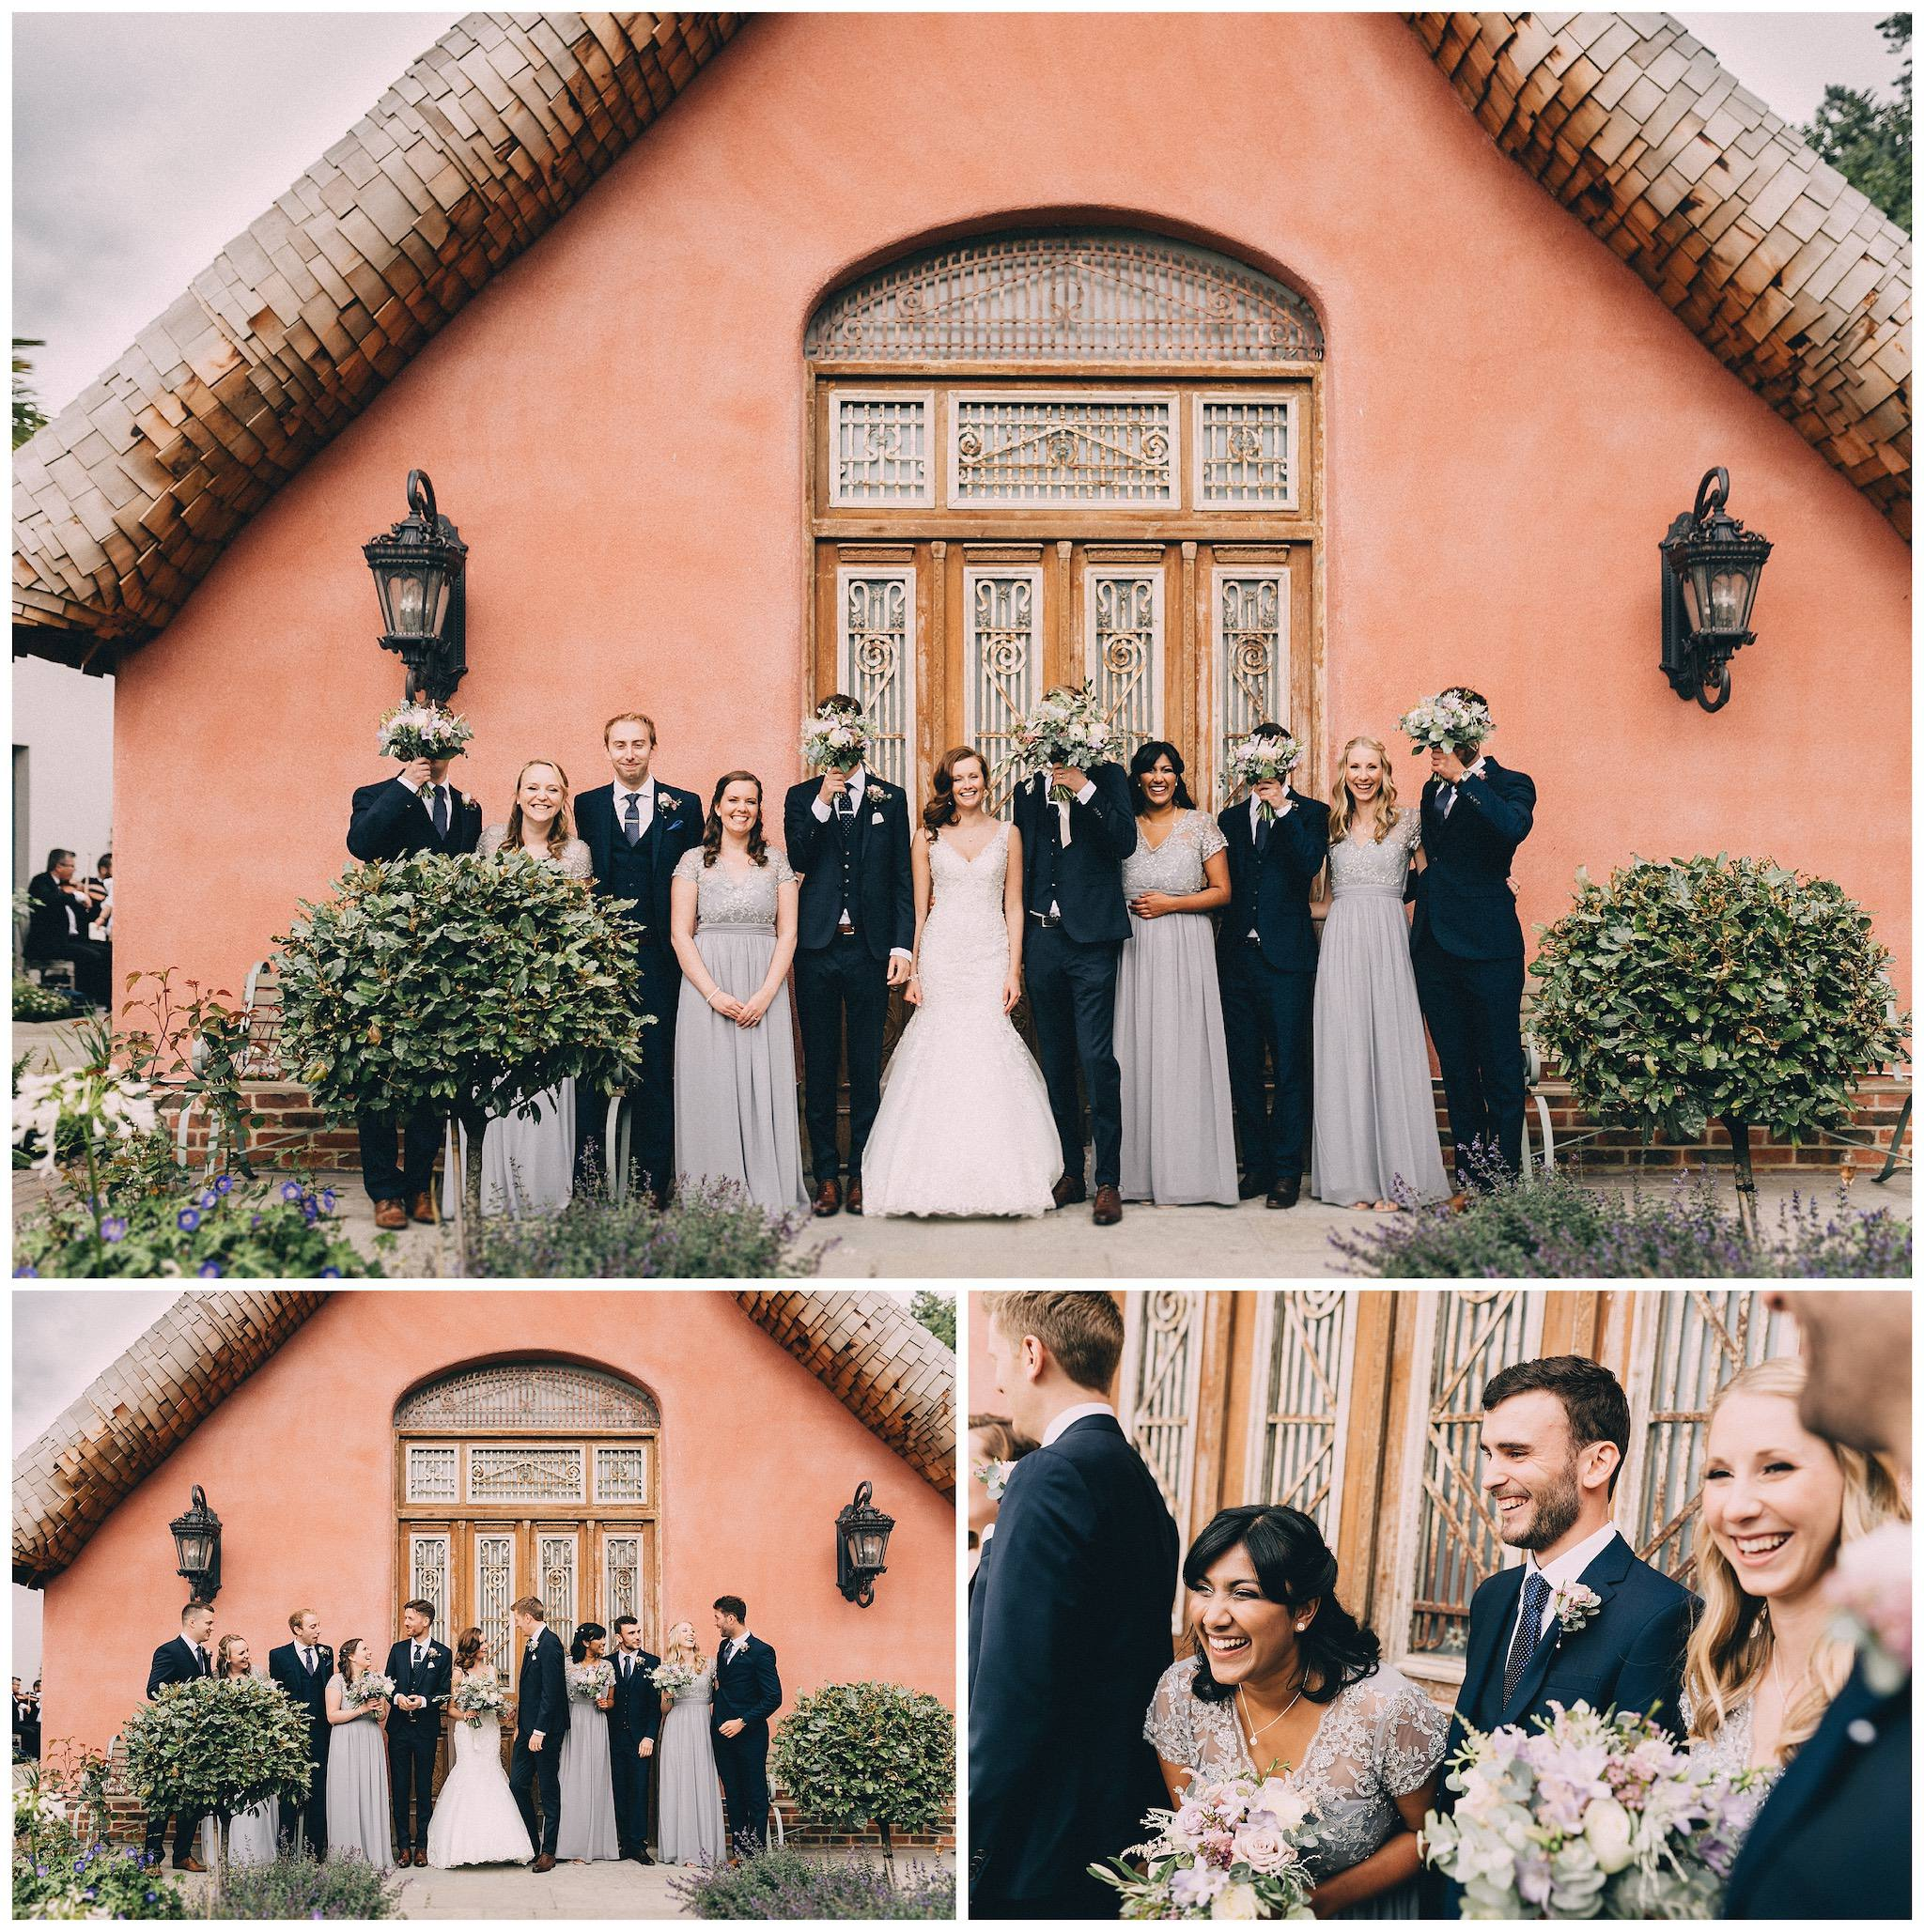 Le-Petit-Chateau-Wedding-Photographer-12.jpg